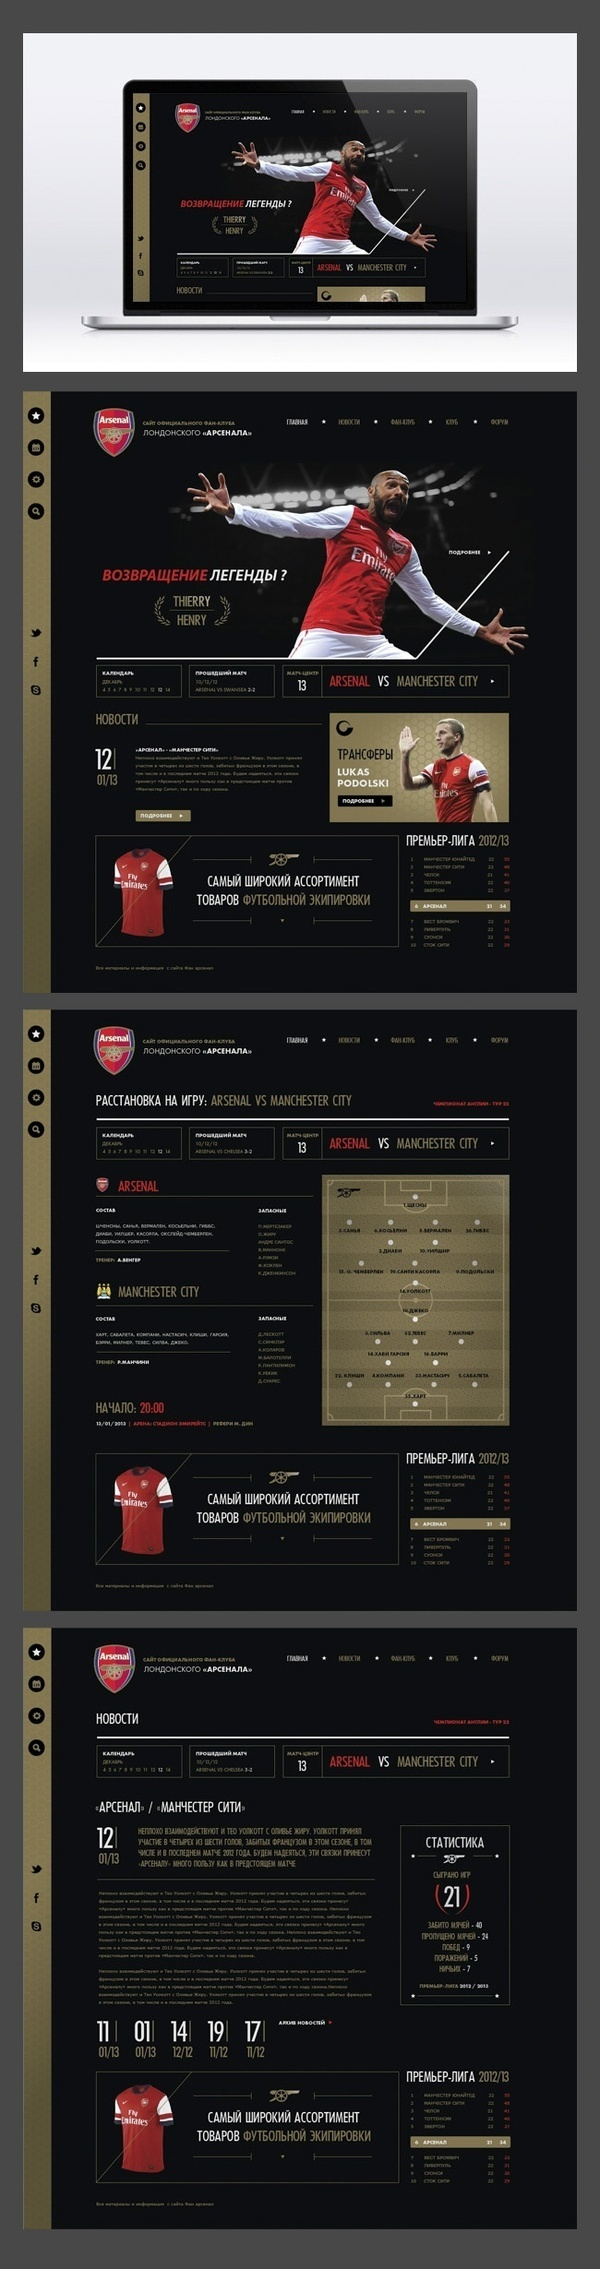 Arsenal by Nicolai Bashkirev | Web Design #website #design #web